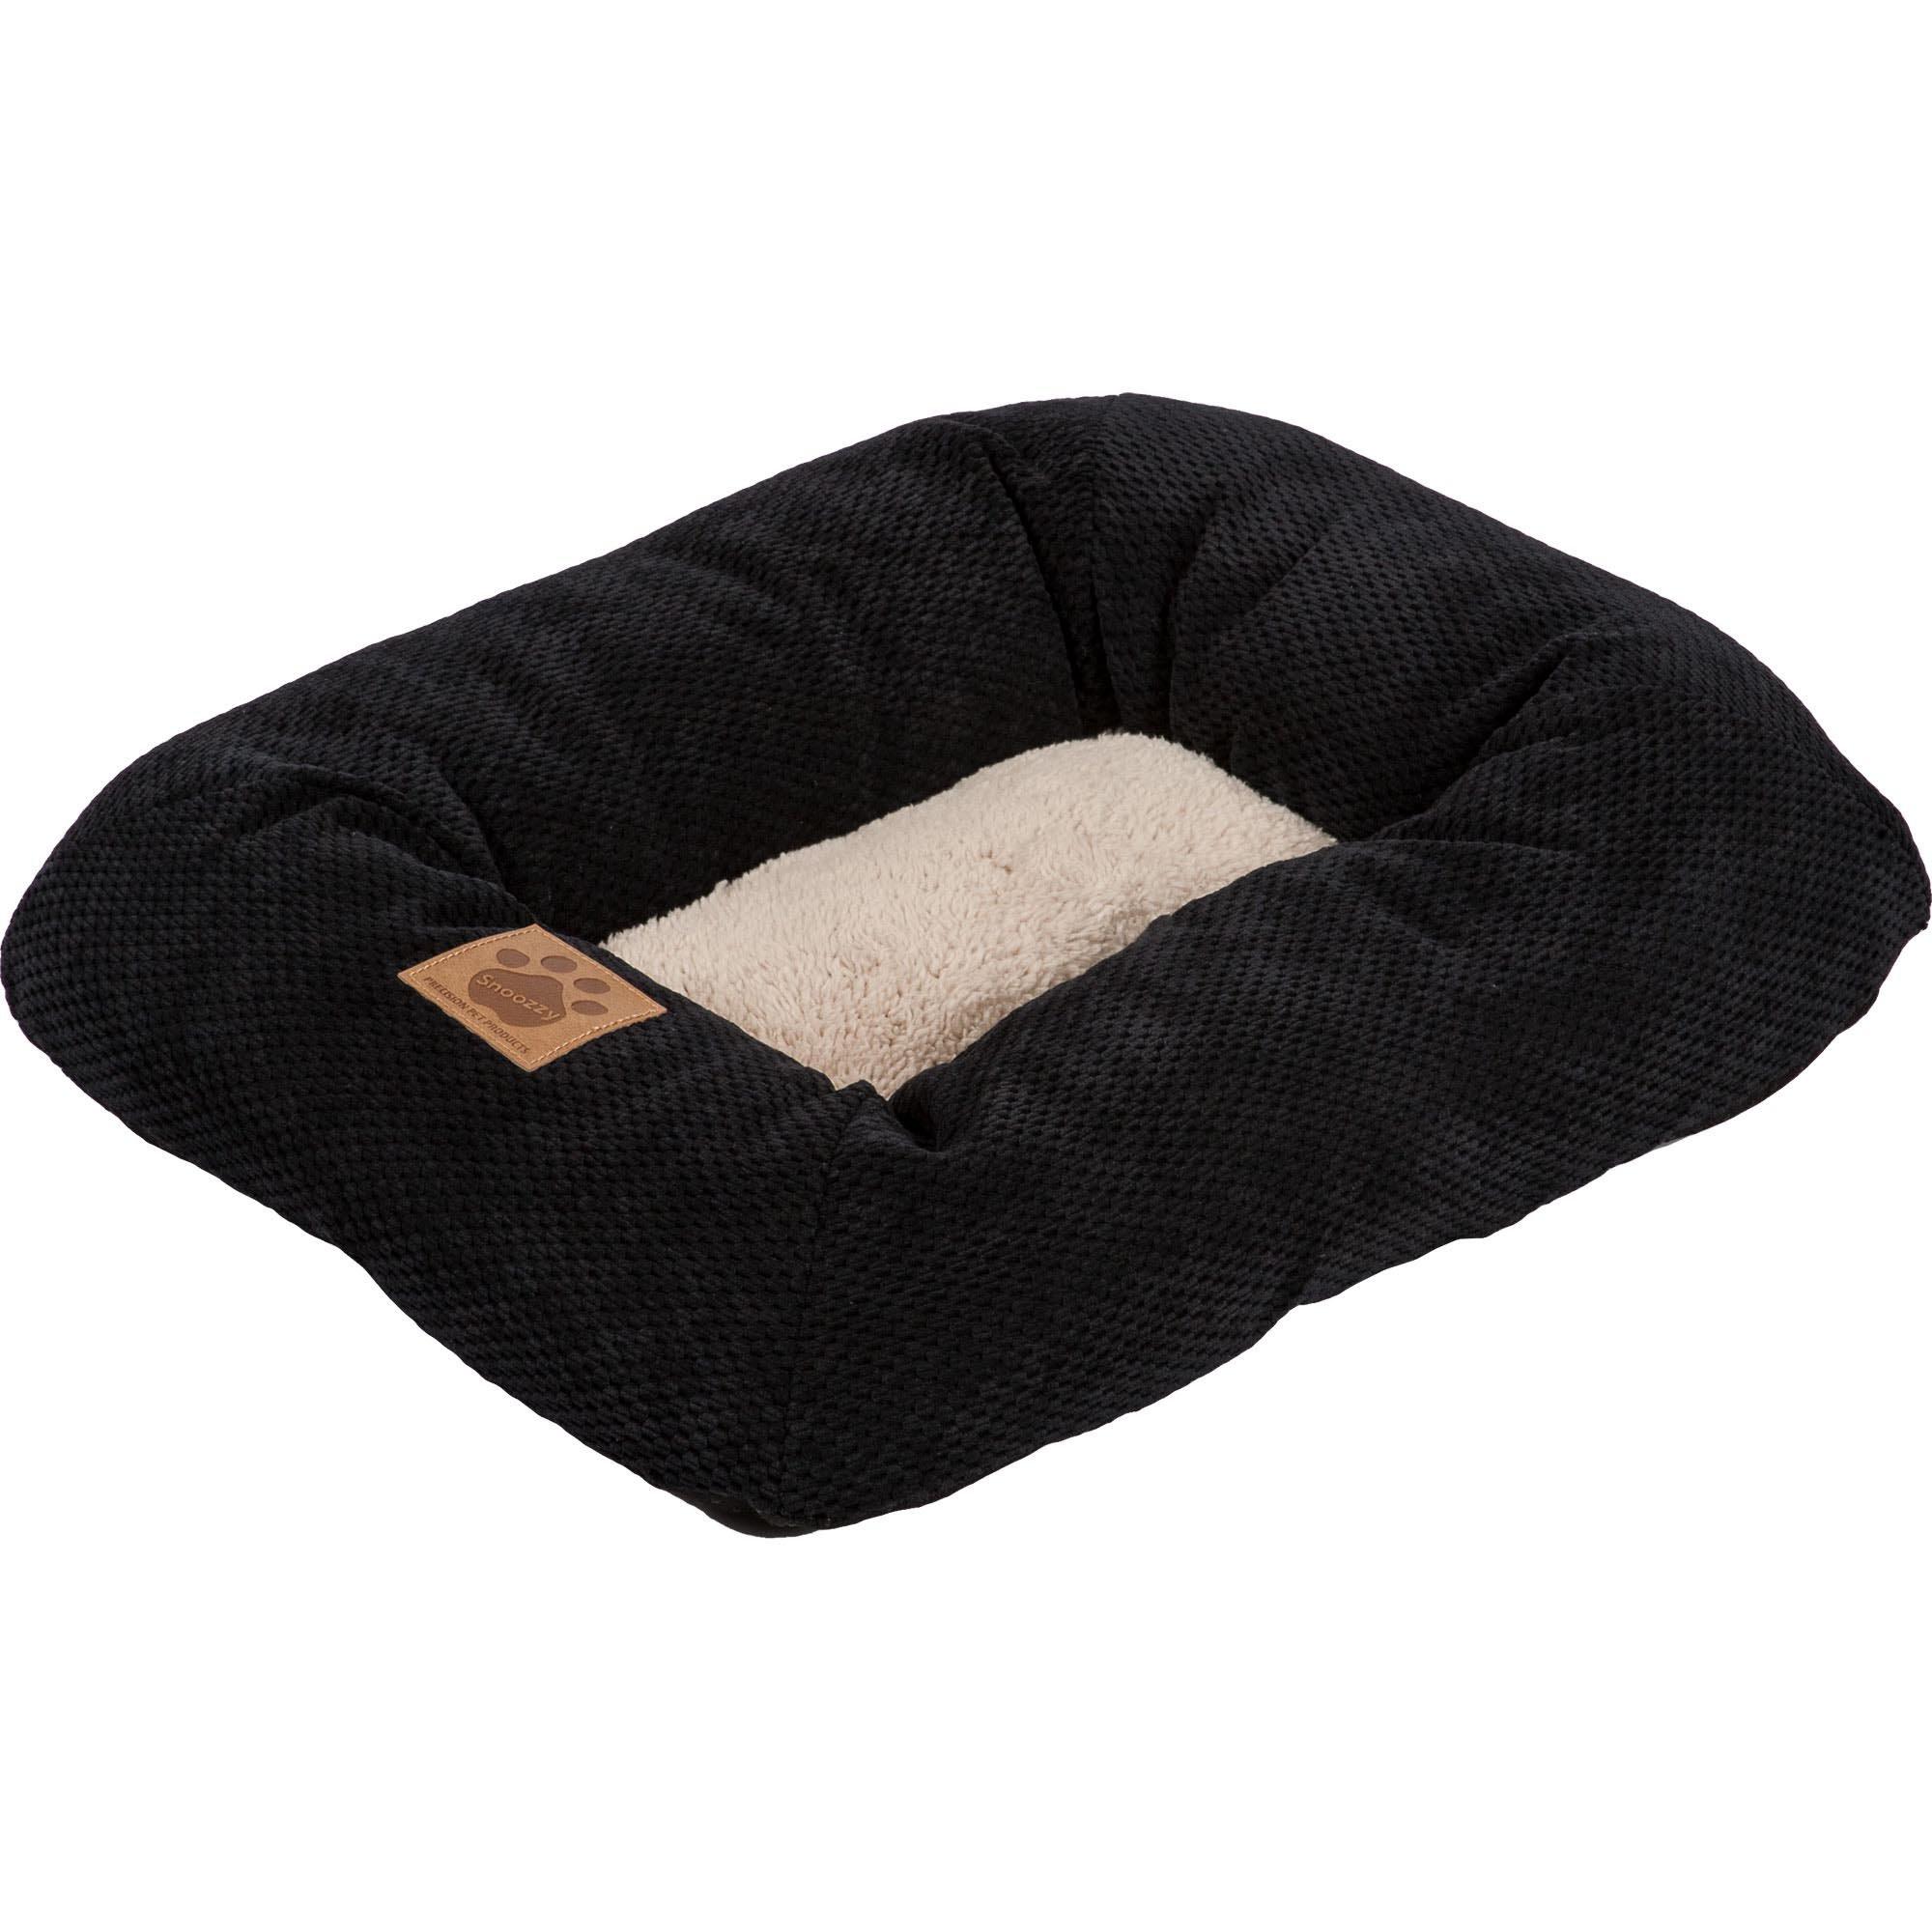 Precision Pet, SnooZZy Mod Chic Low Bumper Mat, 1000 Black